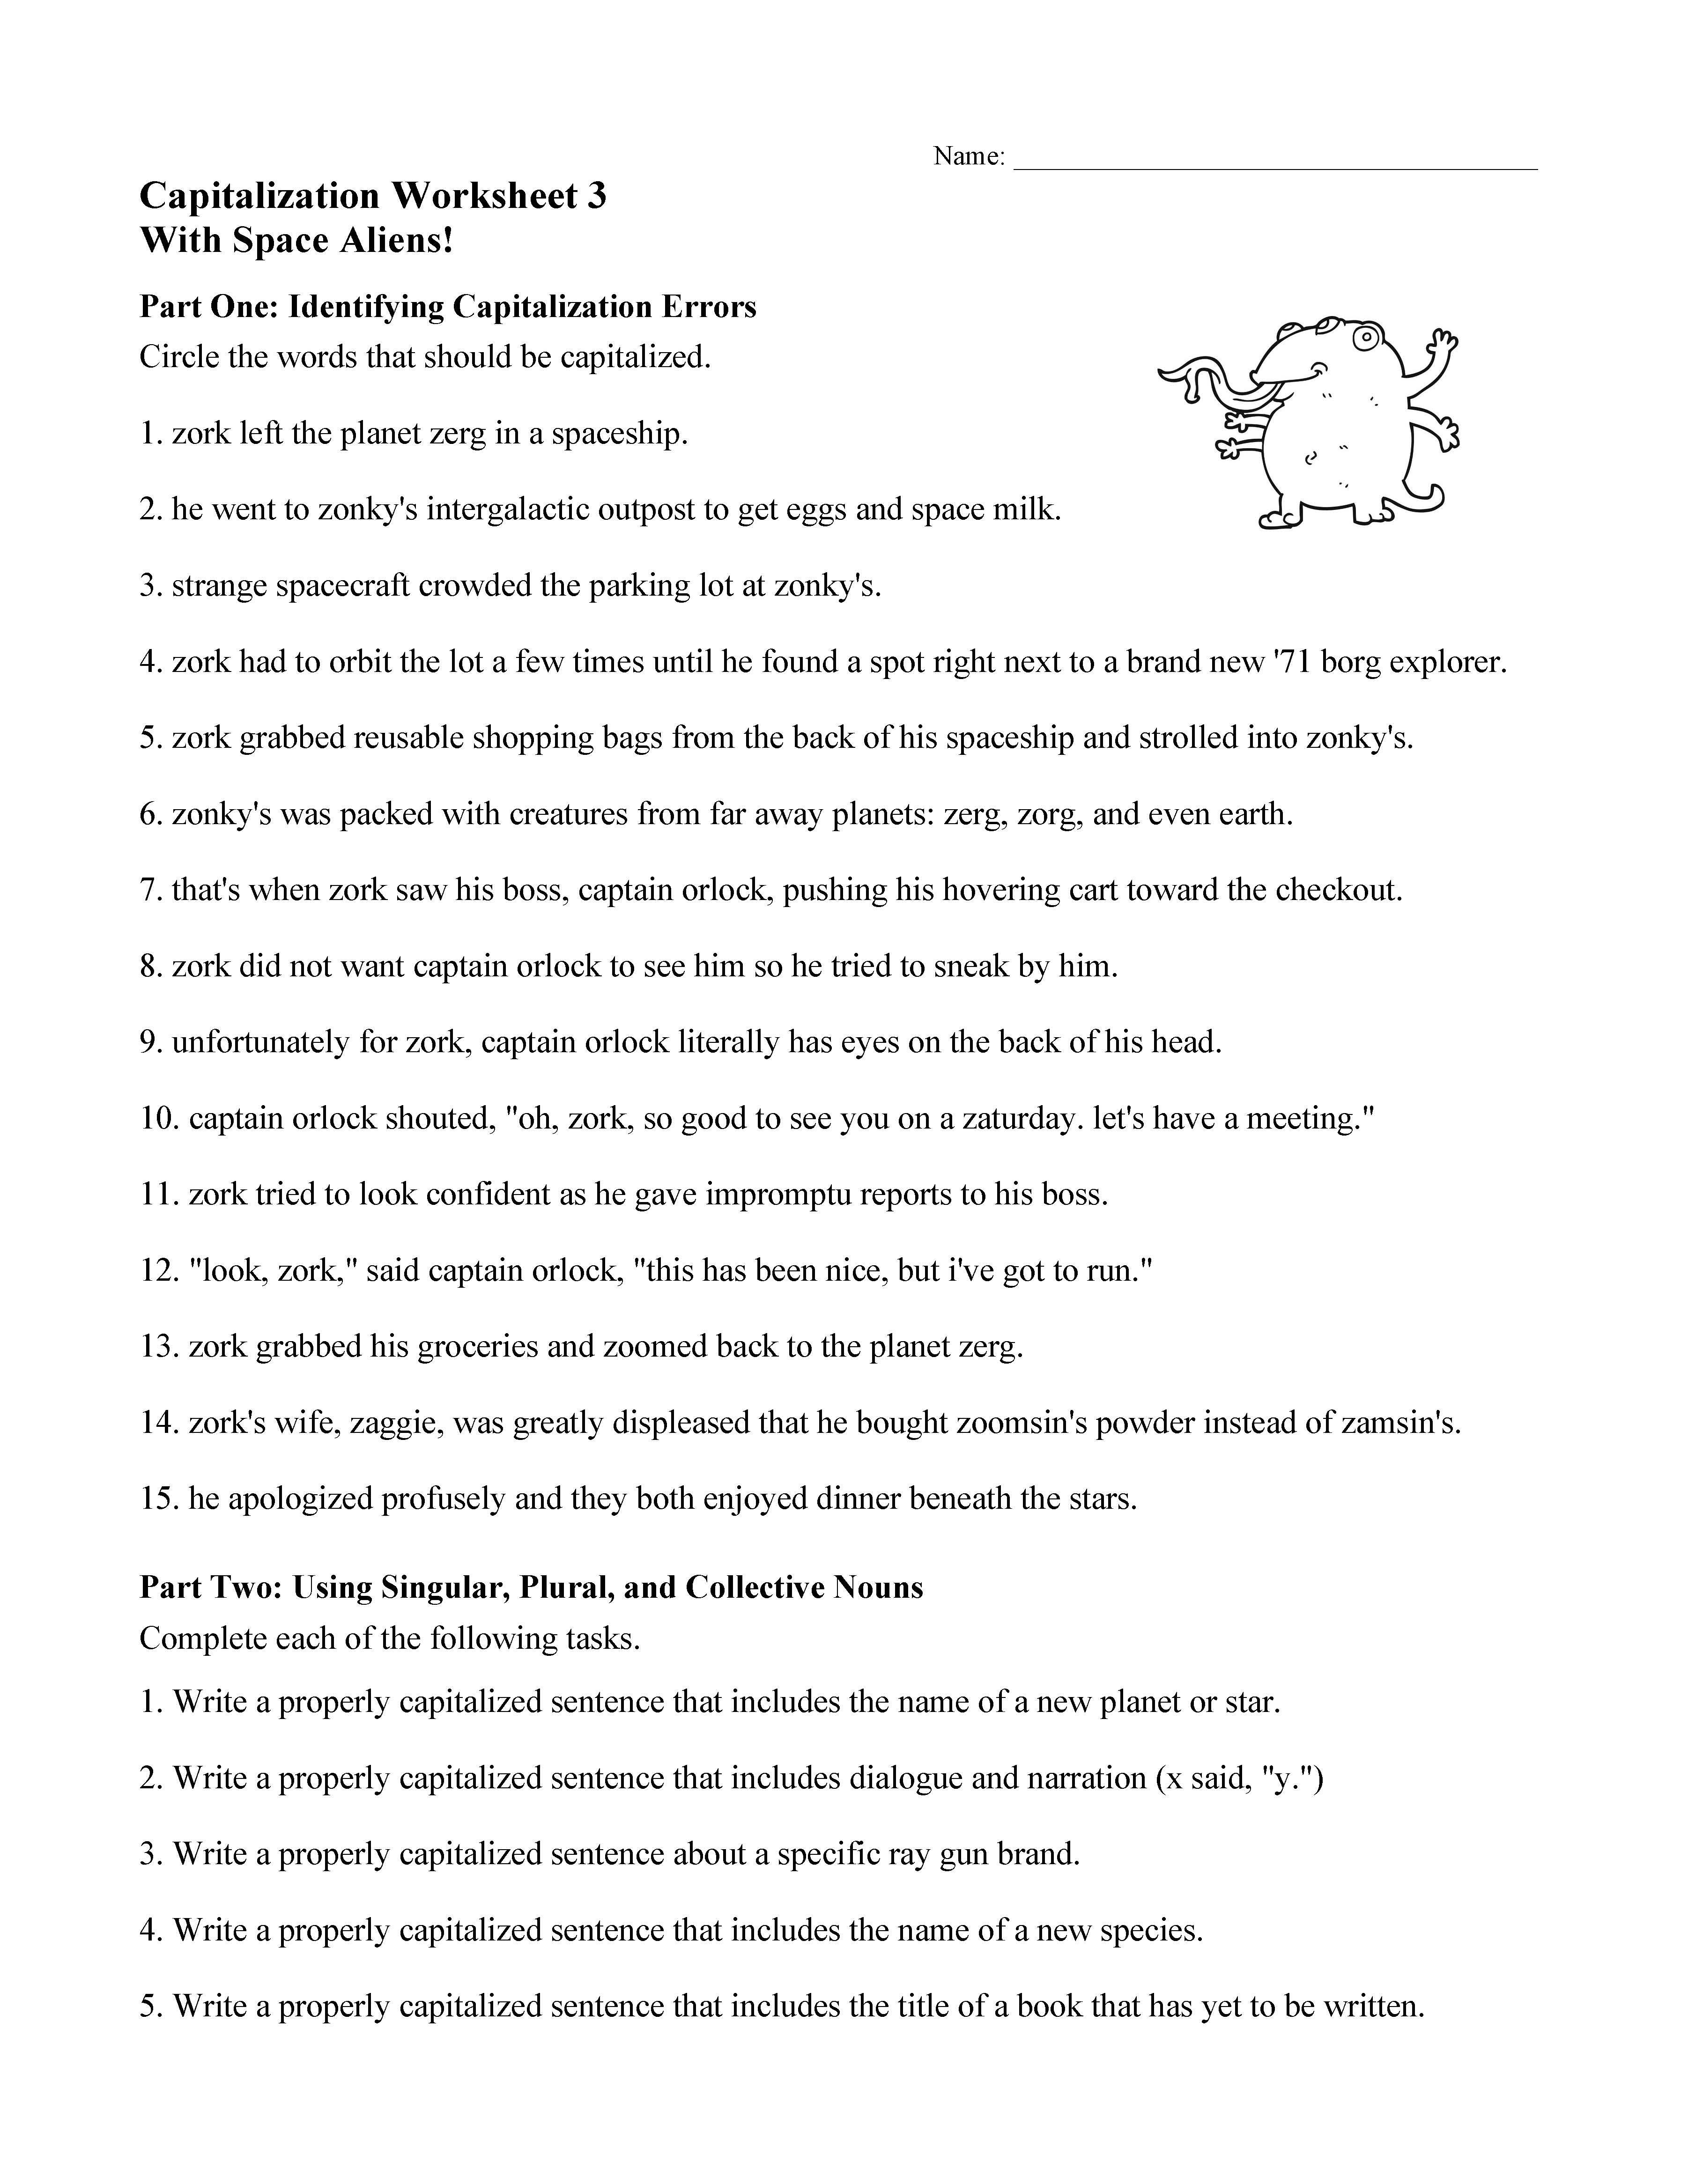 Capitalization Worksheet 3